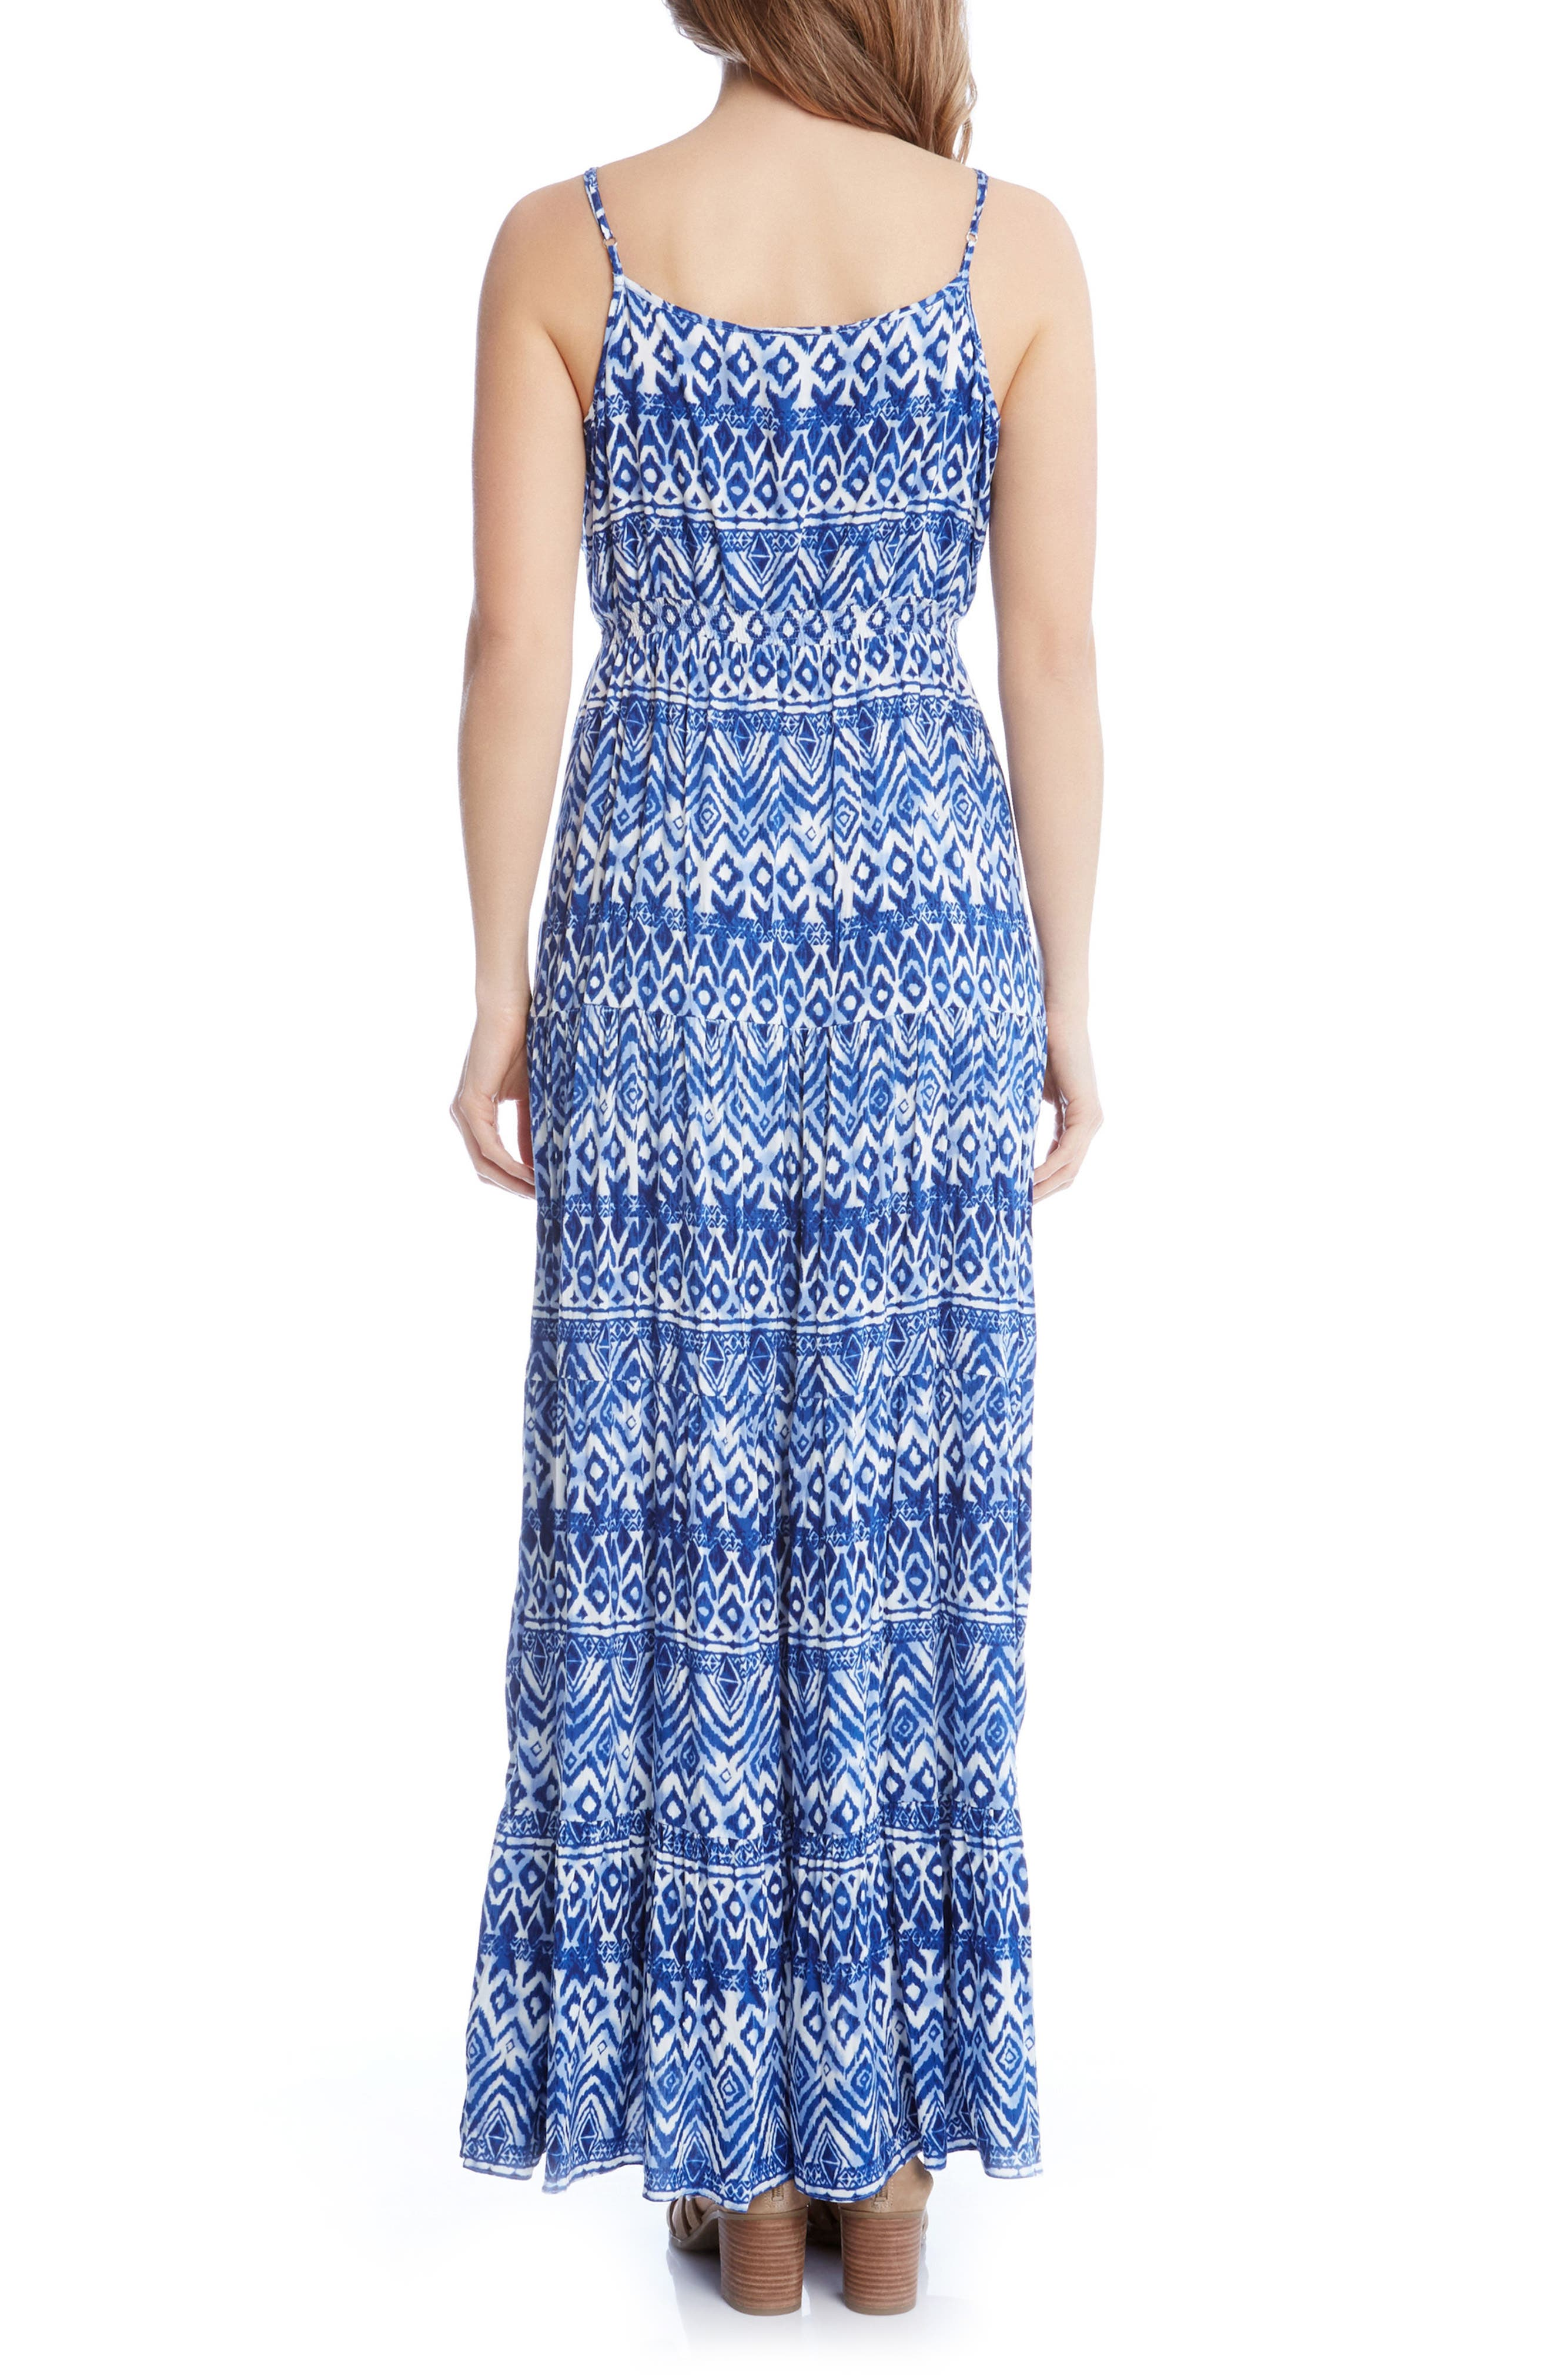 Batik Print Tiered Maxi Dress,                             Alternate thumbnail 2, color,                             460